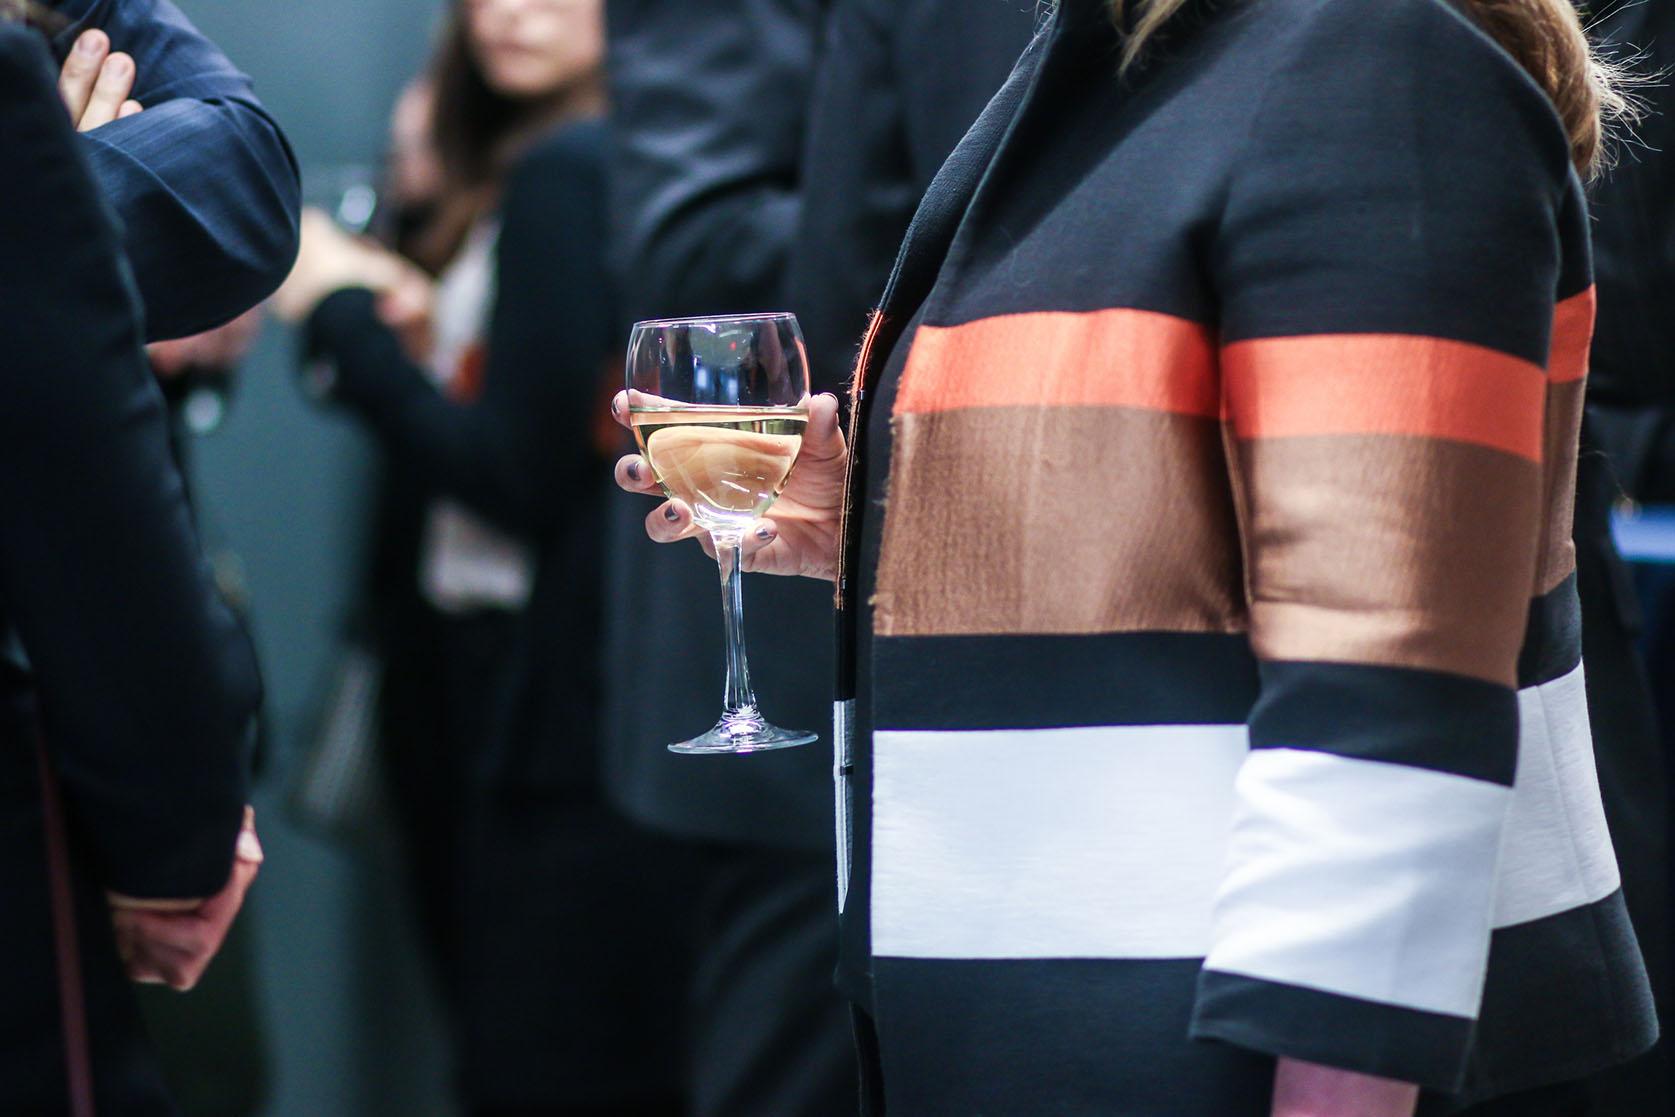 woman alone networking event wine.jpg